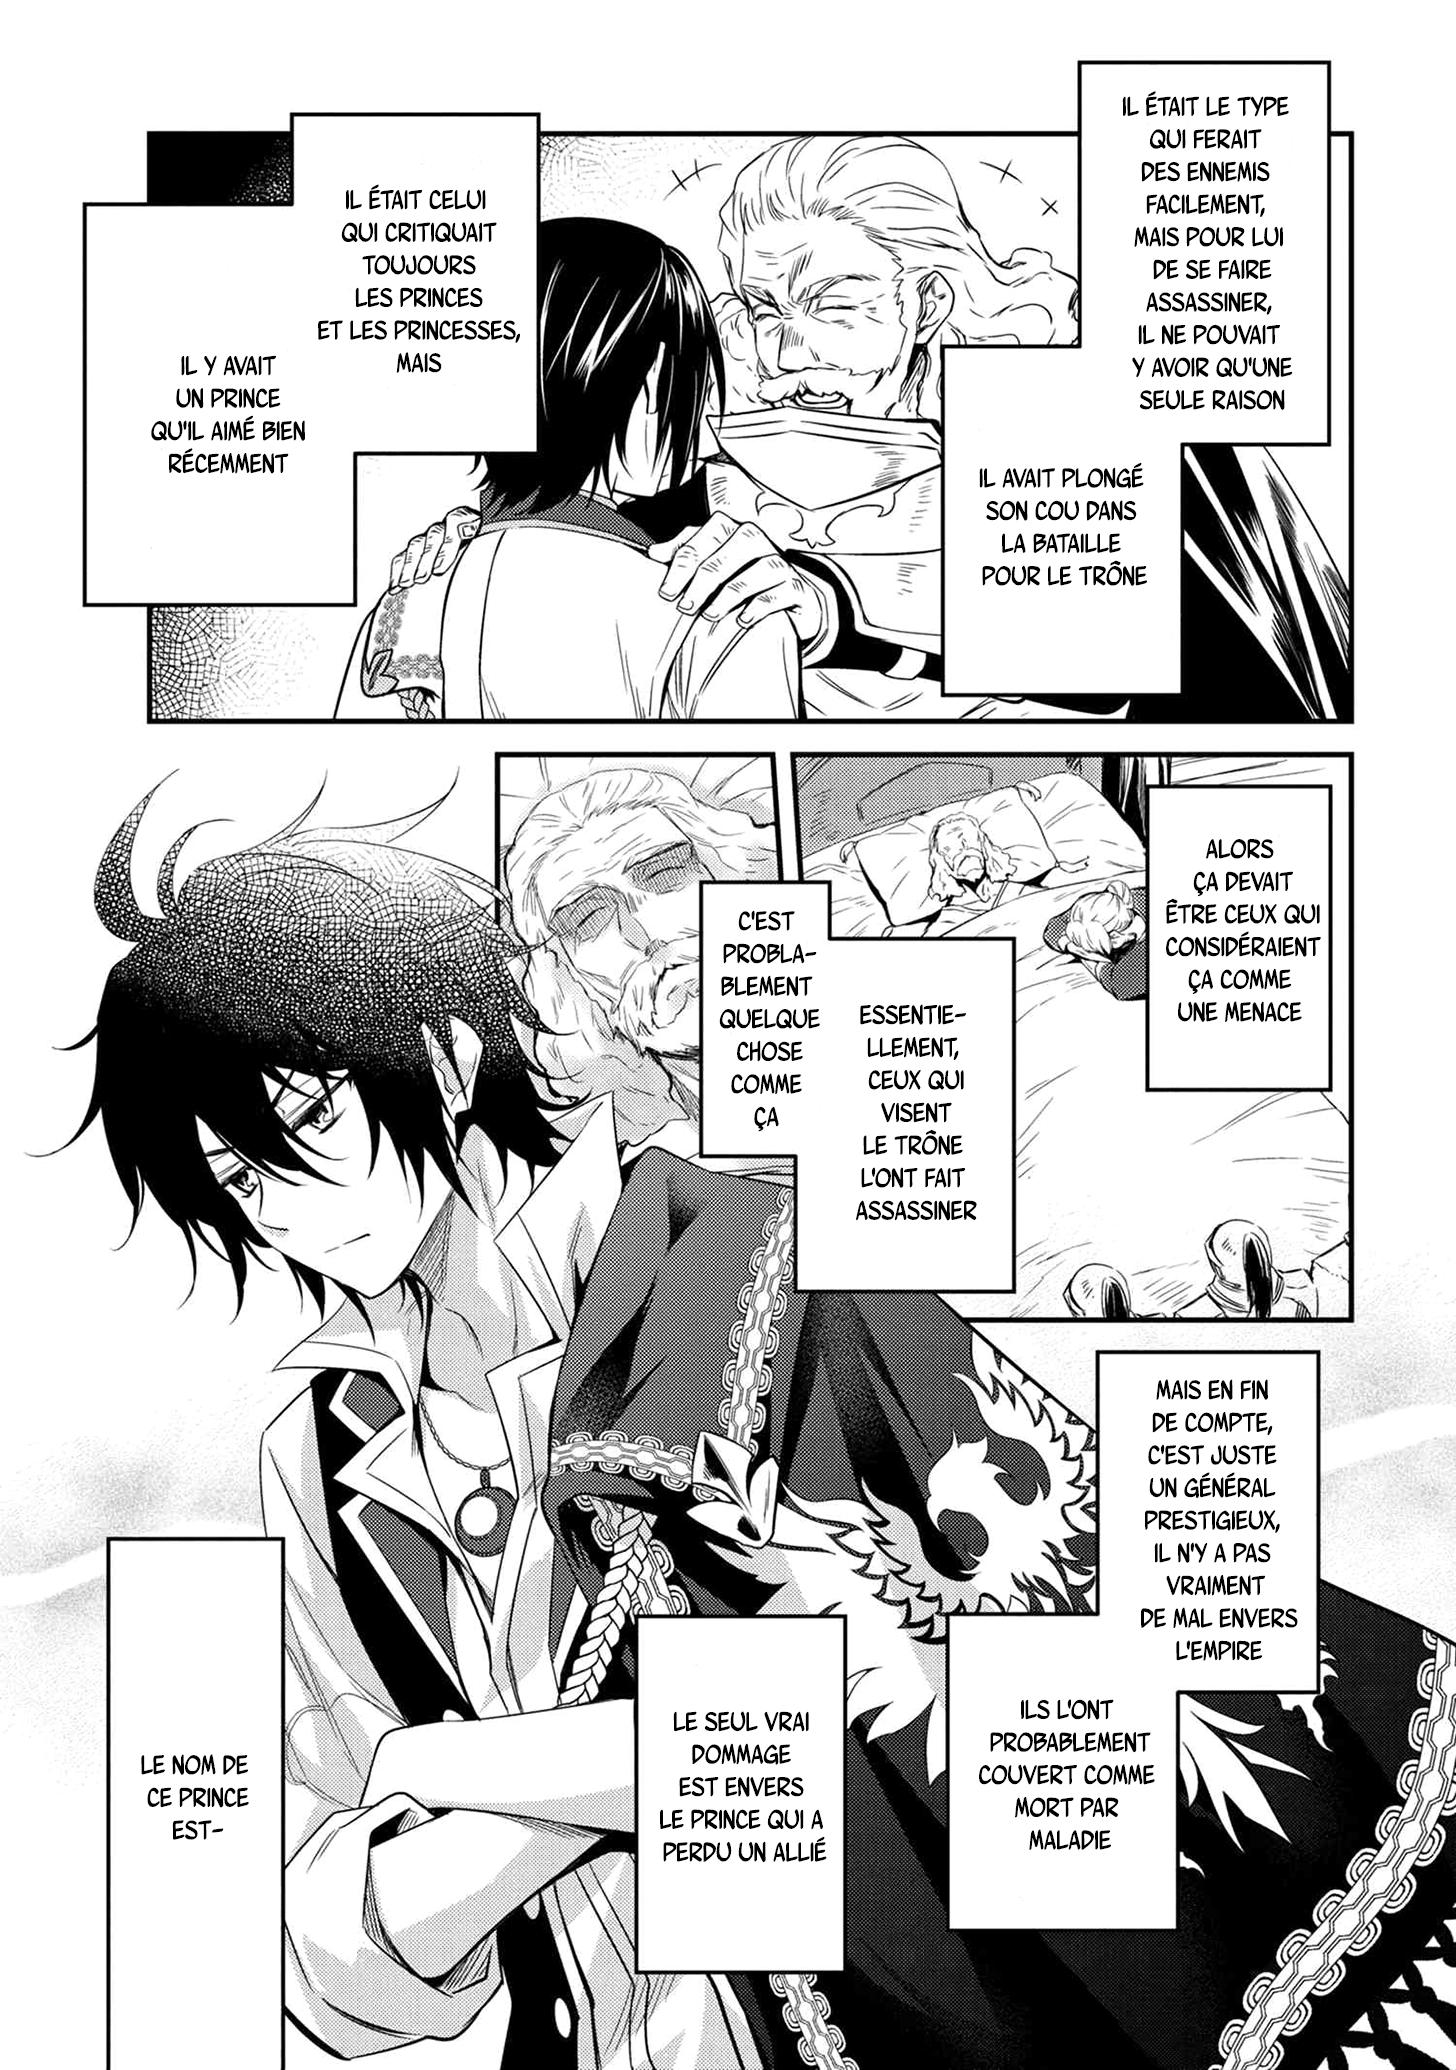 https://nine.mangadogs.com/fr_manga/pic2/58/12154/517535/TheStrongestDullPrincesSec_11_855.png Page 12